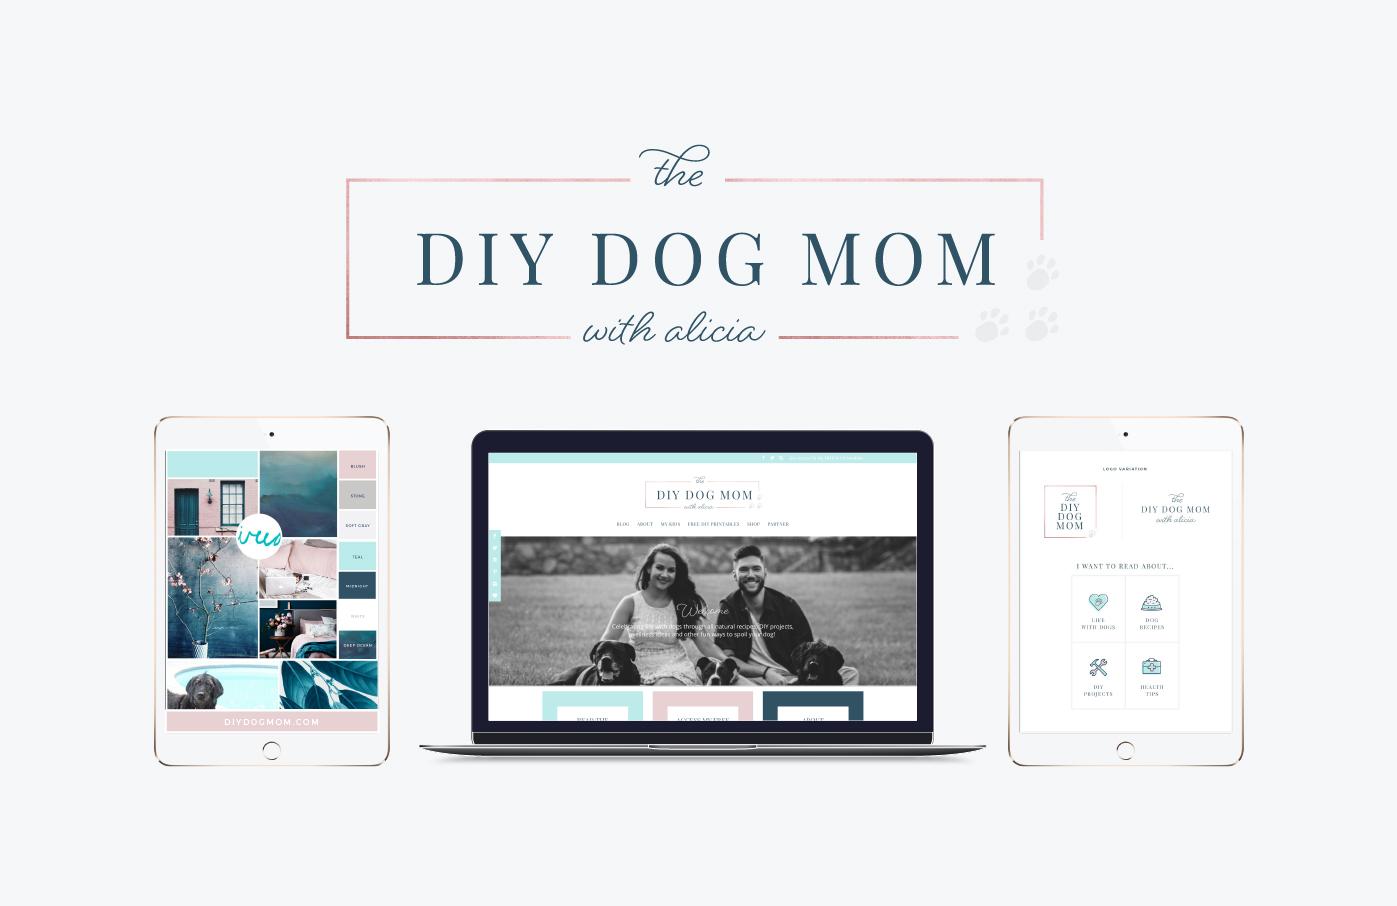 The DIY Dog Mom